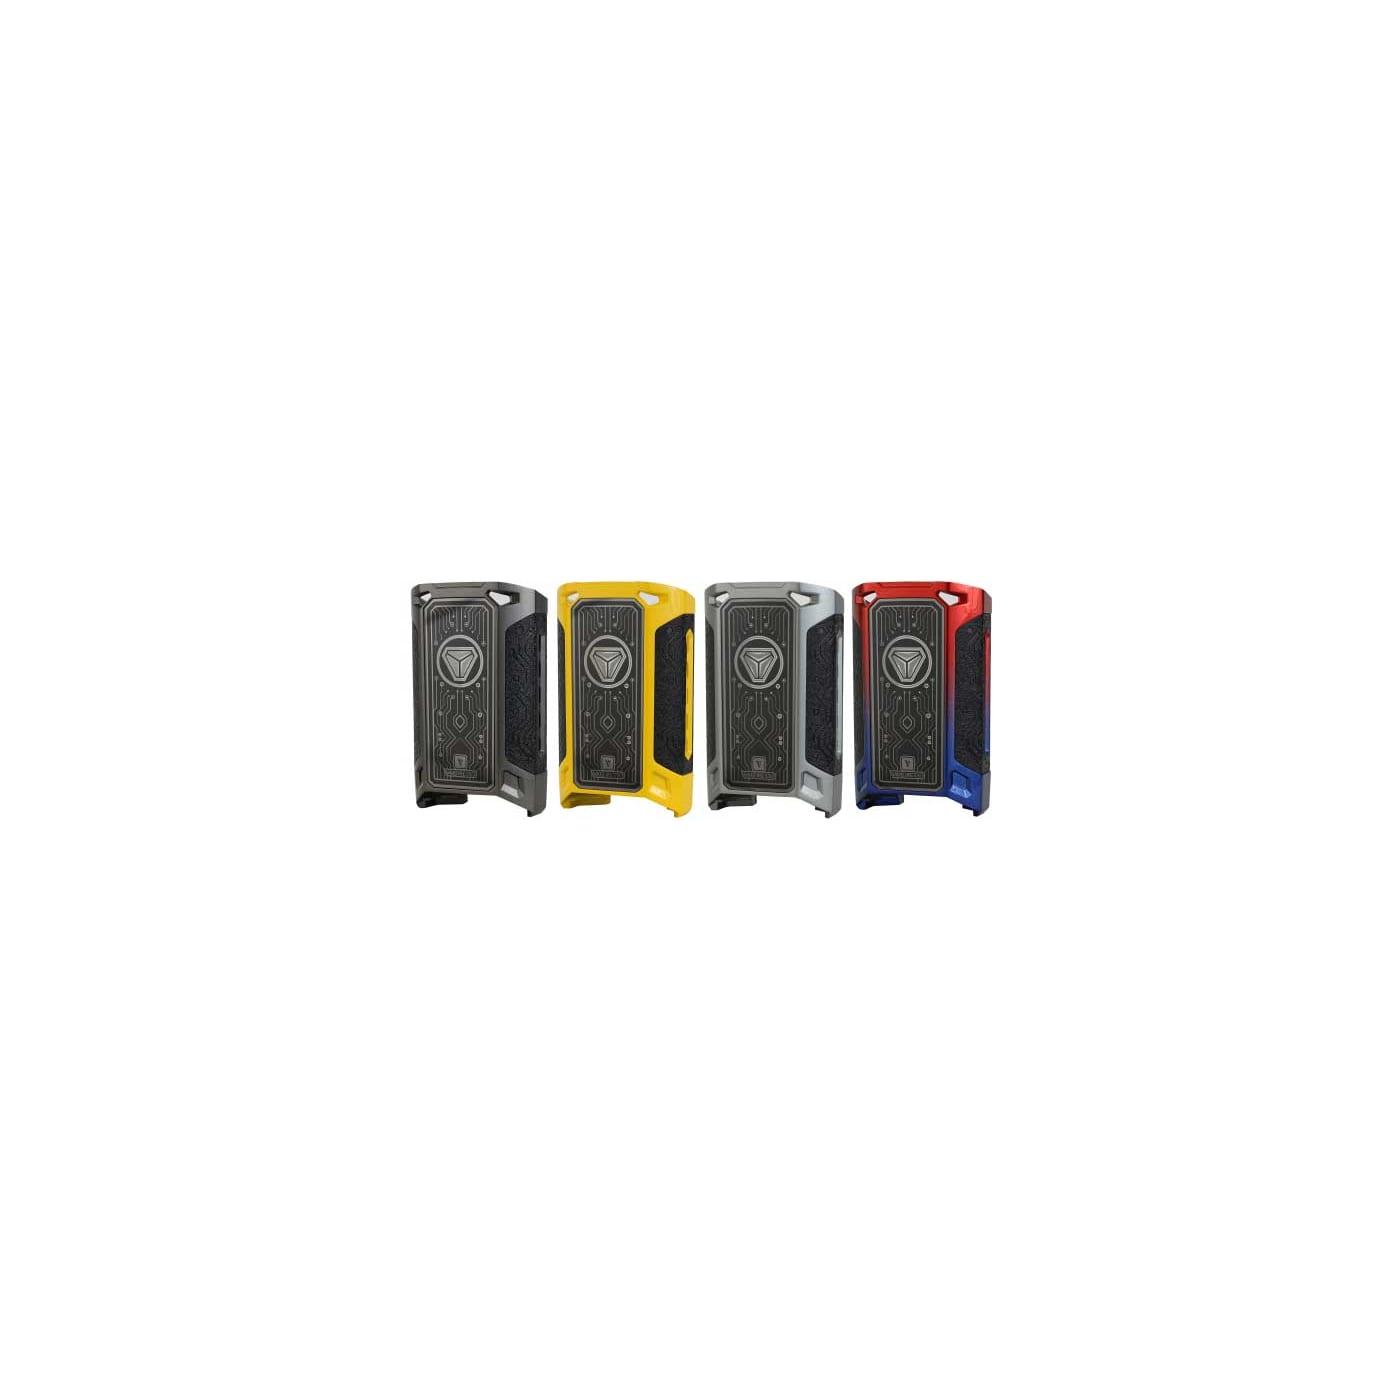 Vaporesso Switcher Mod Case